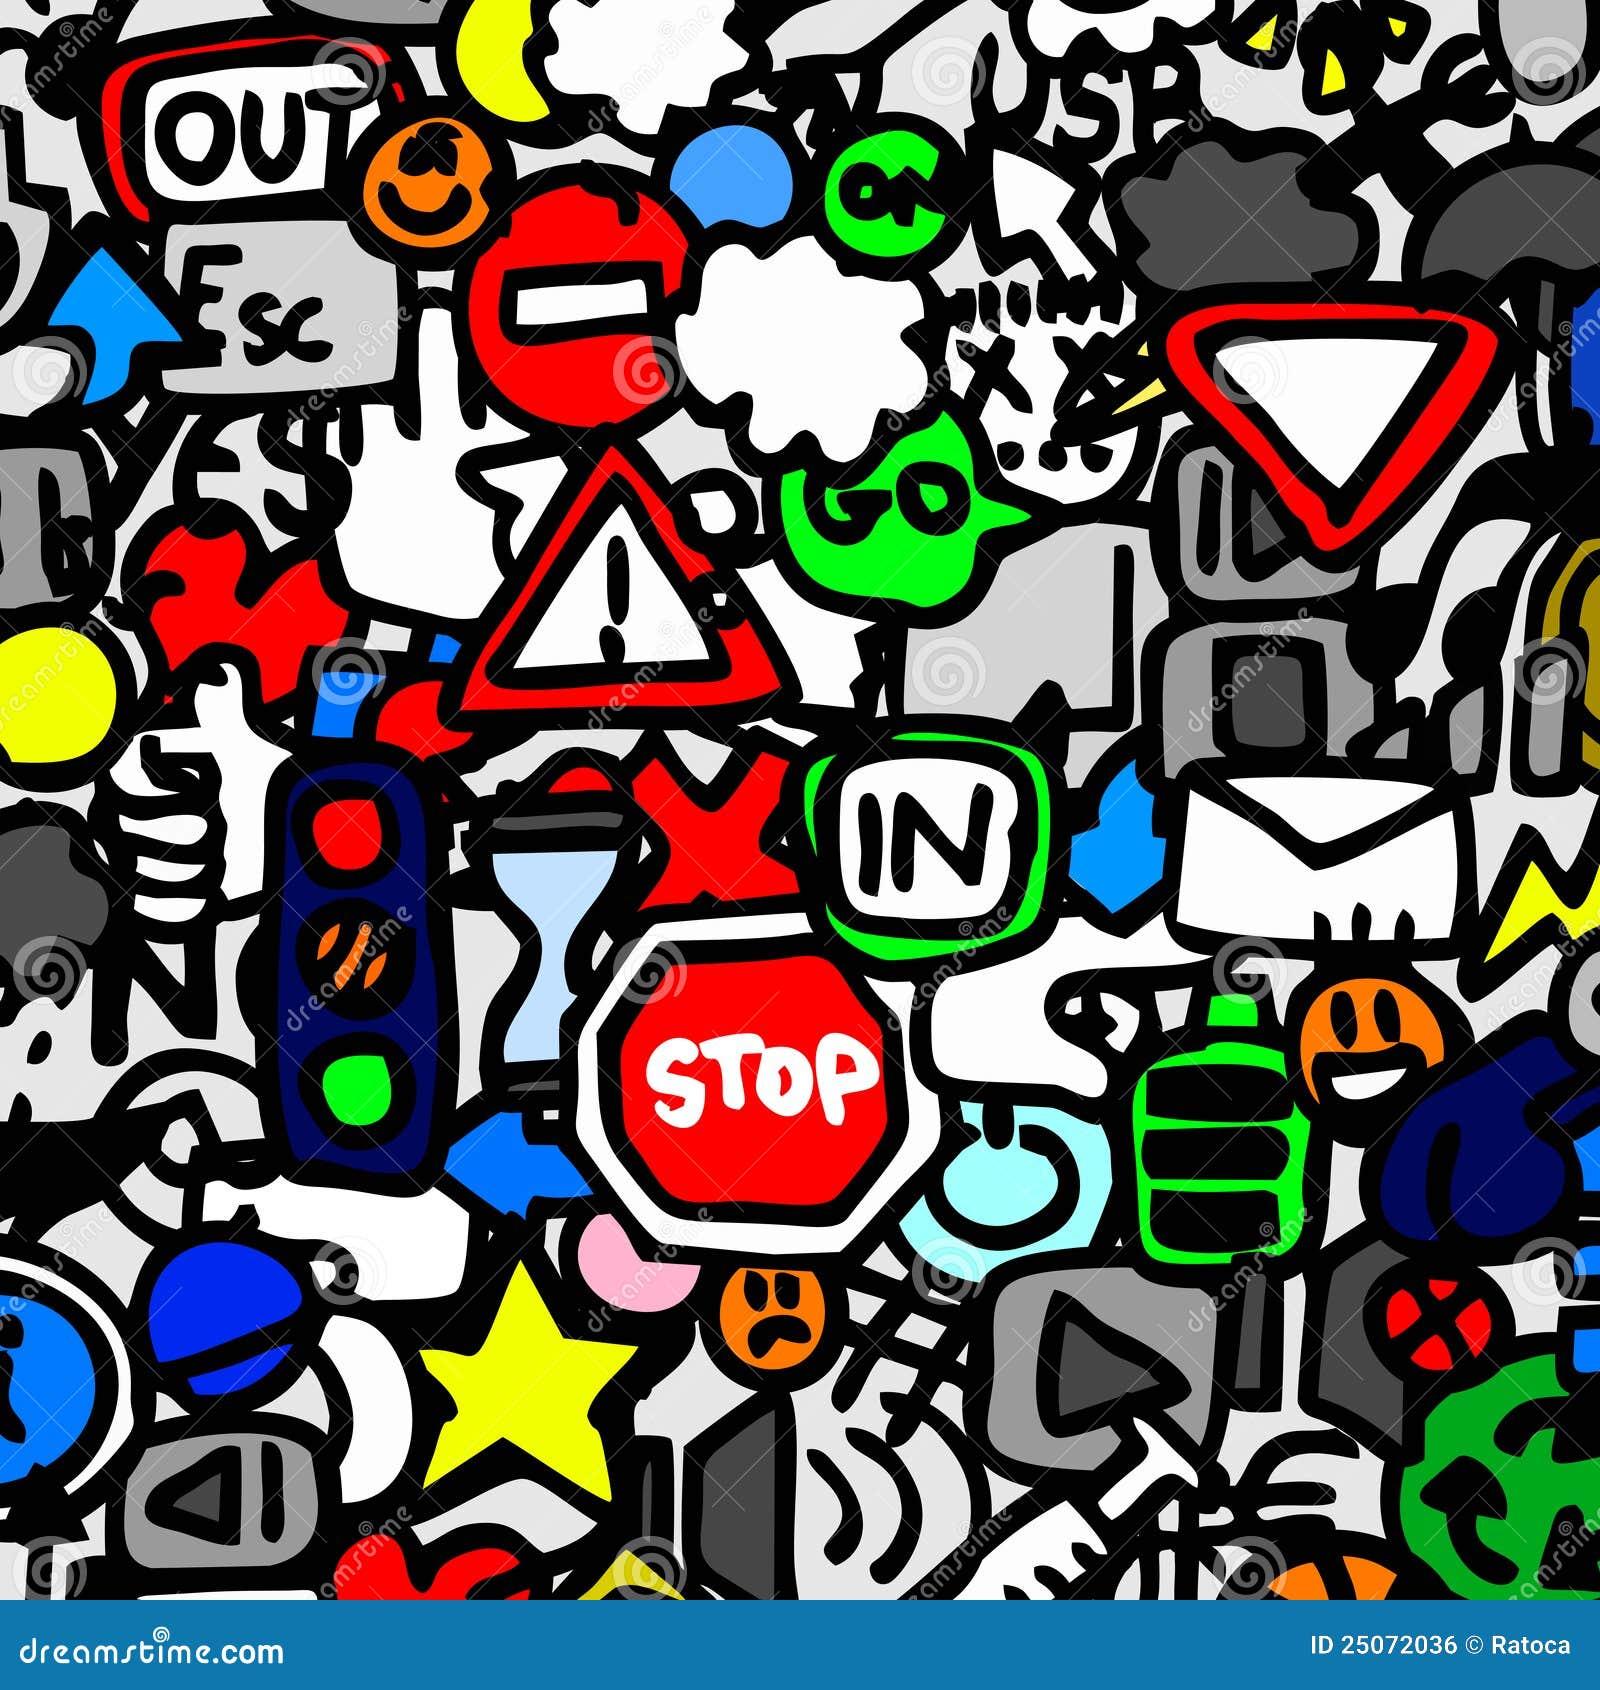 Traffic Color Wallpaper Stock Vector. Illustration Of